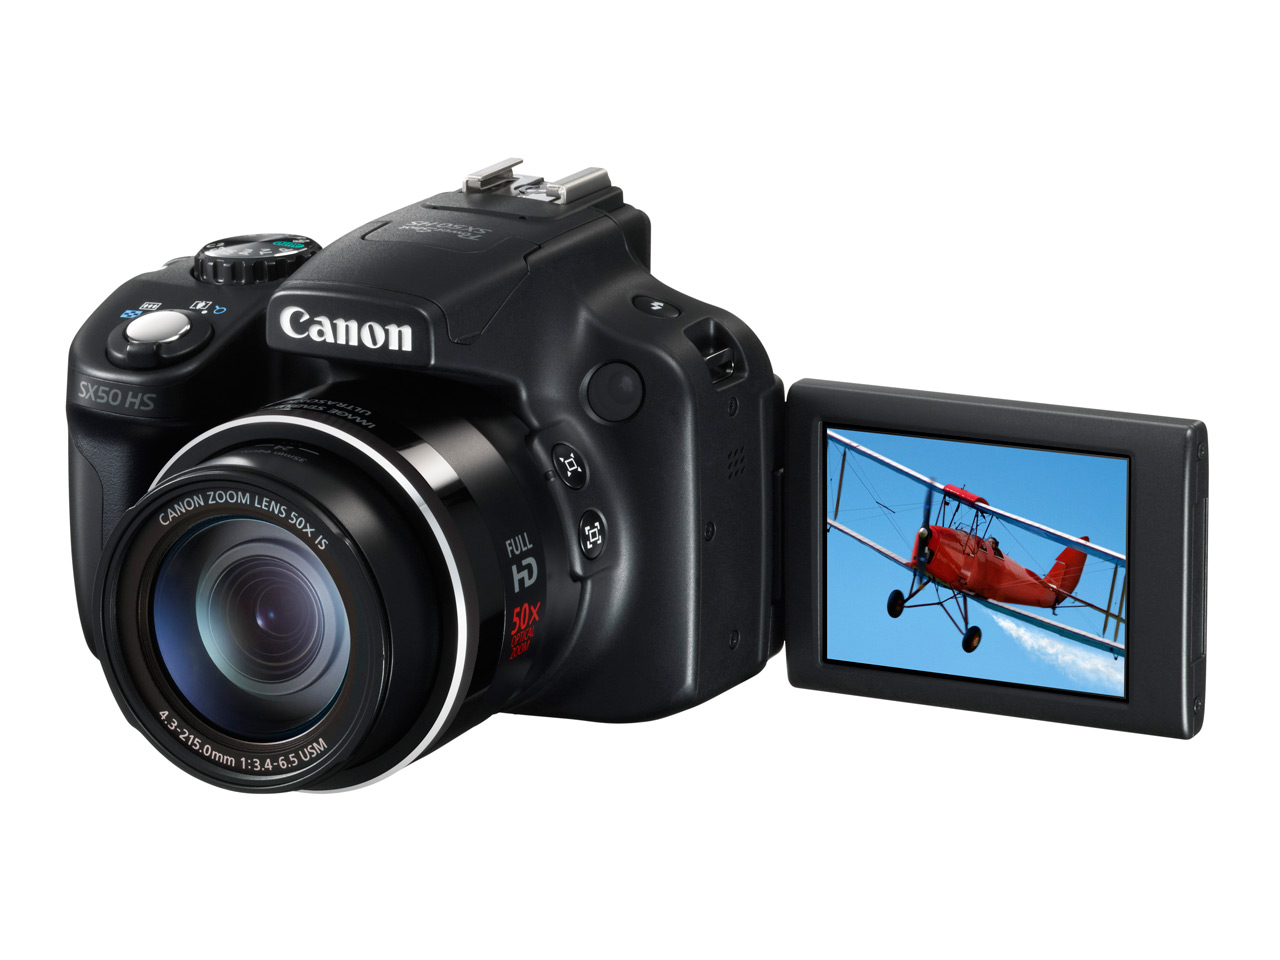 canon sx50 hs aparat foto bridge cu zoom optic 50x. Black Bedroom Furniture Sets. Home Design Ideas